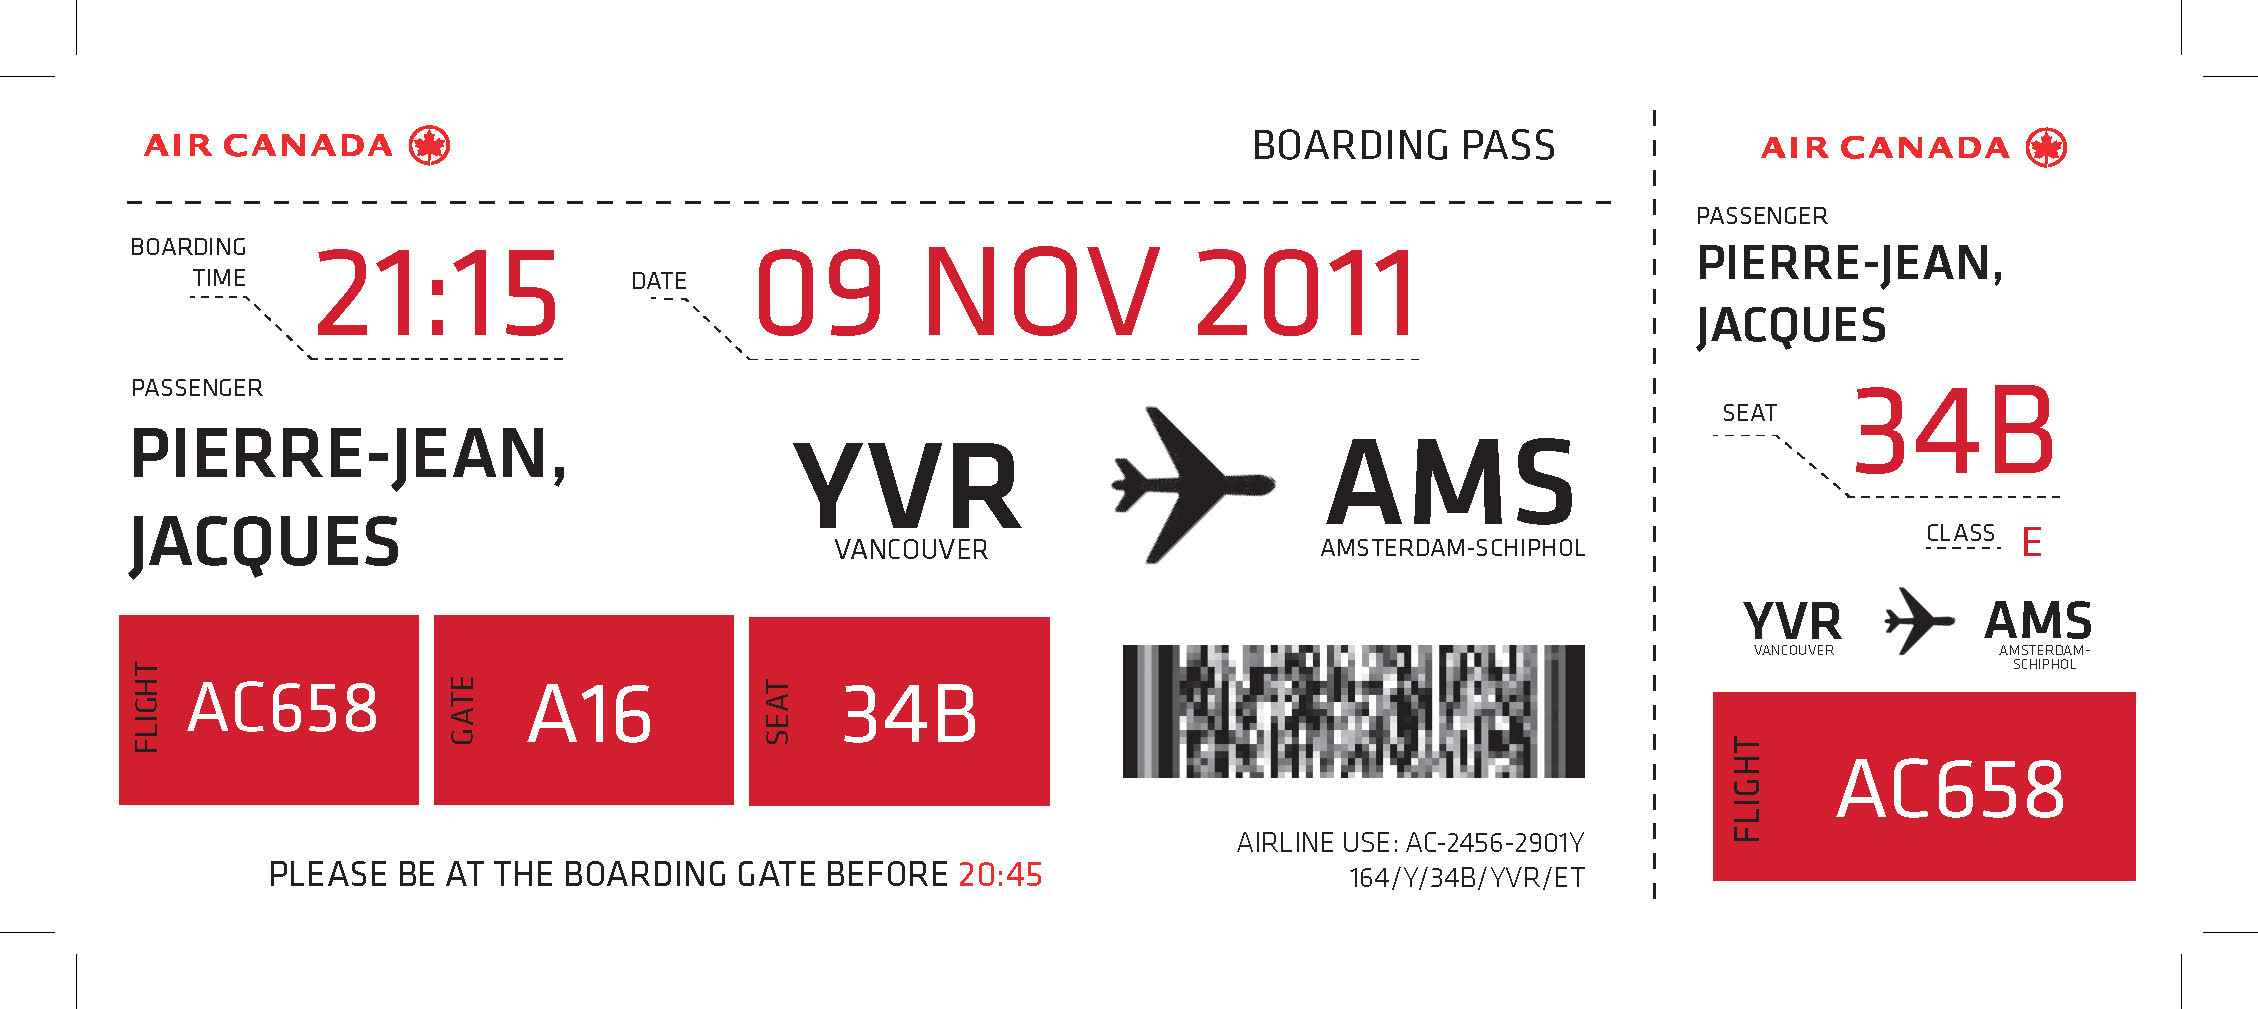 Canada Airline Boarding Pass Design